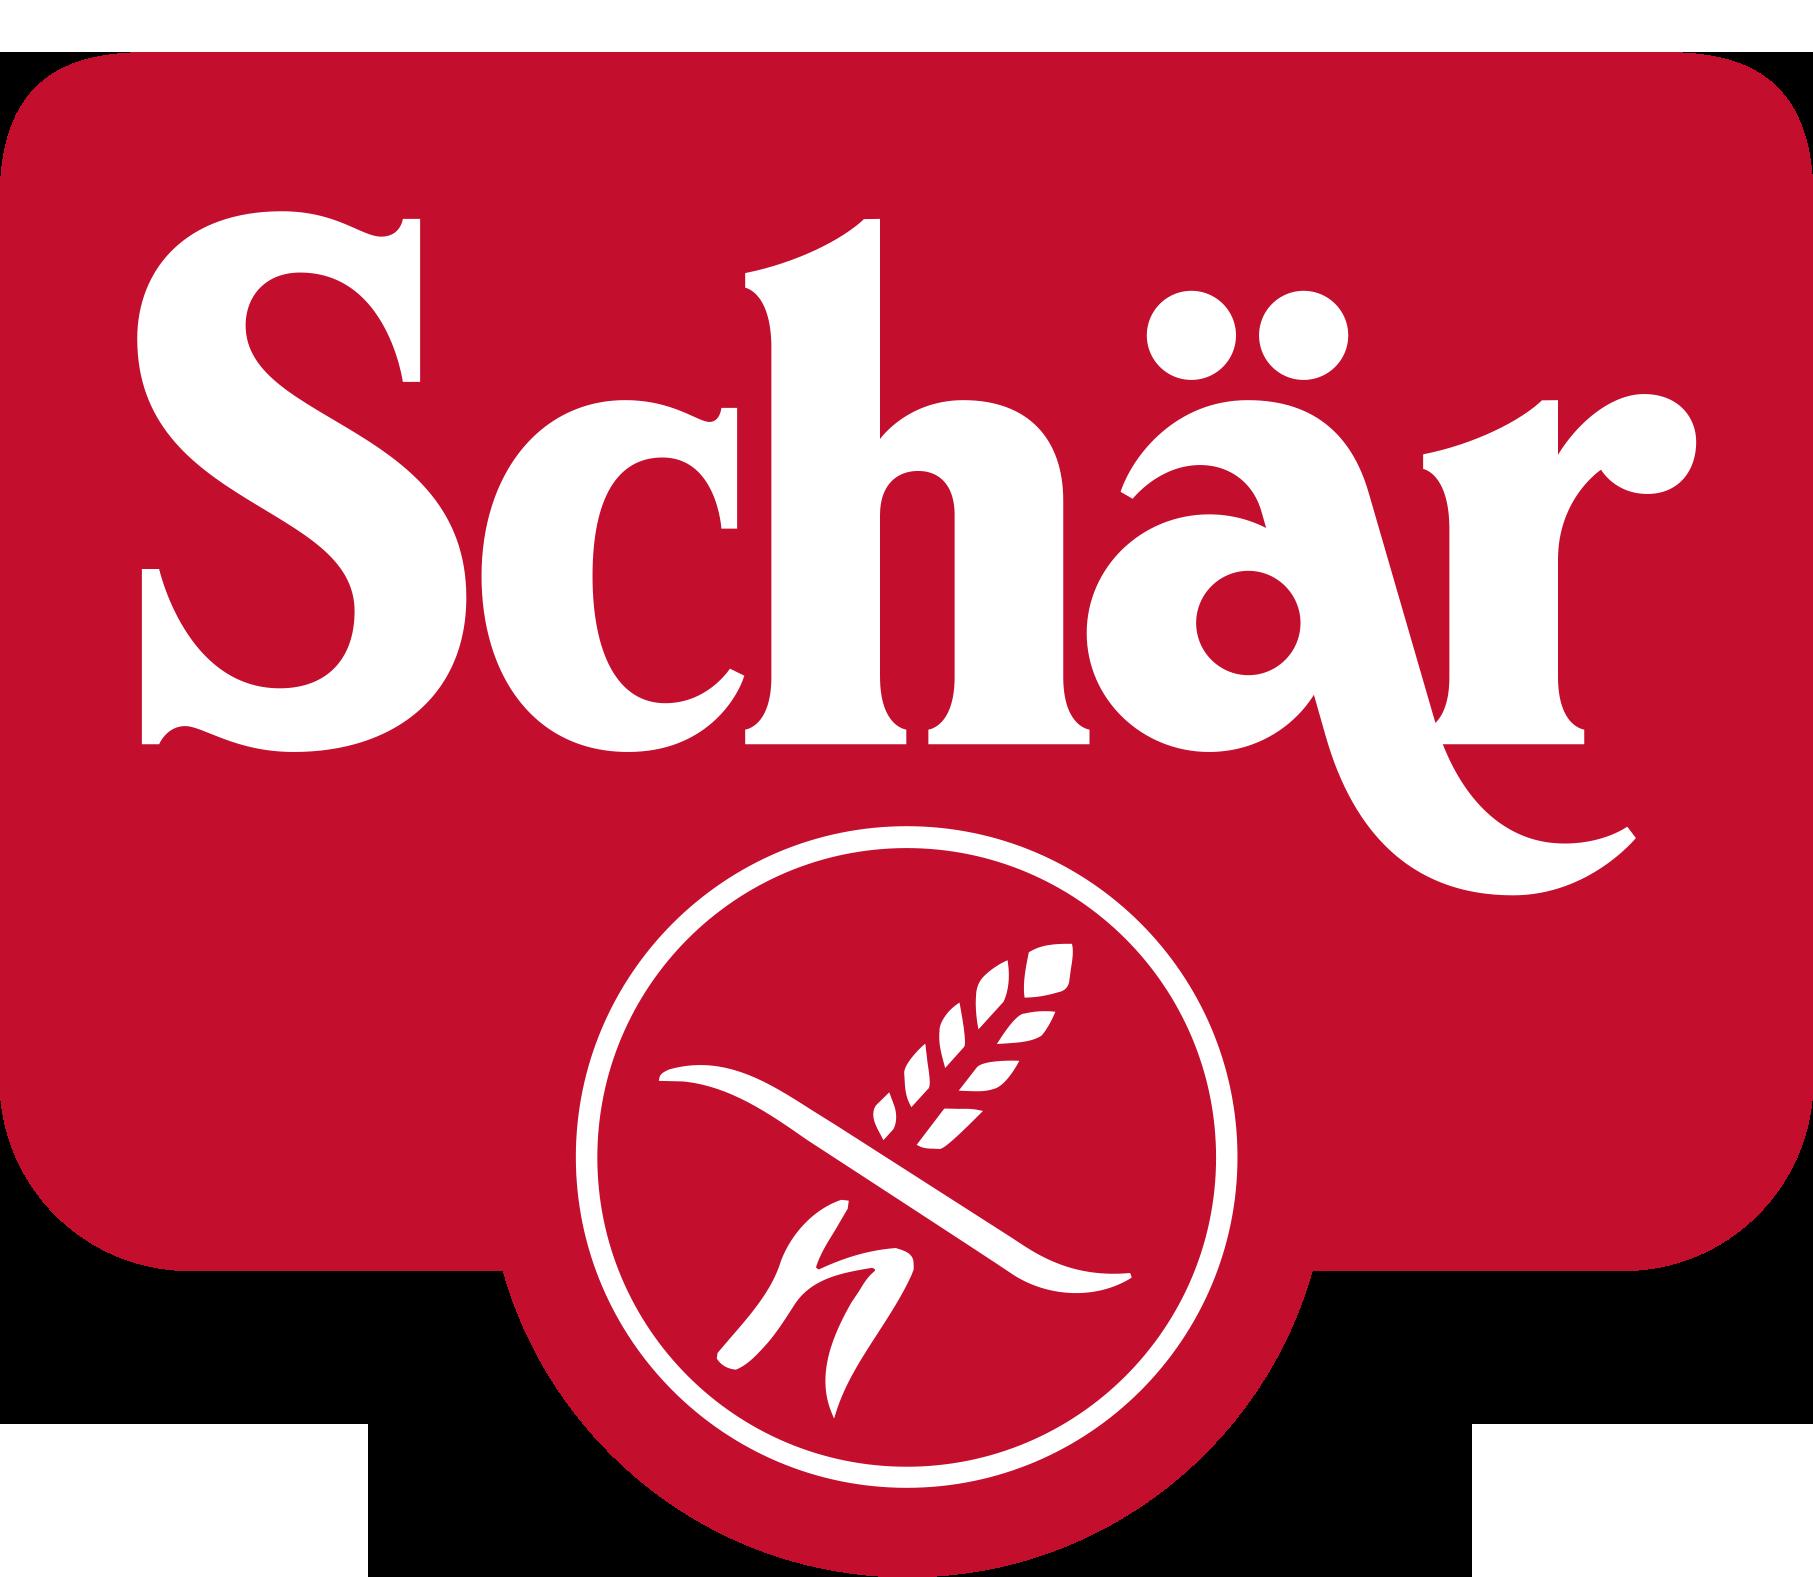 Dr. Schär vuelve a la Argentina